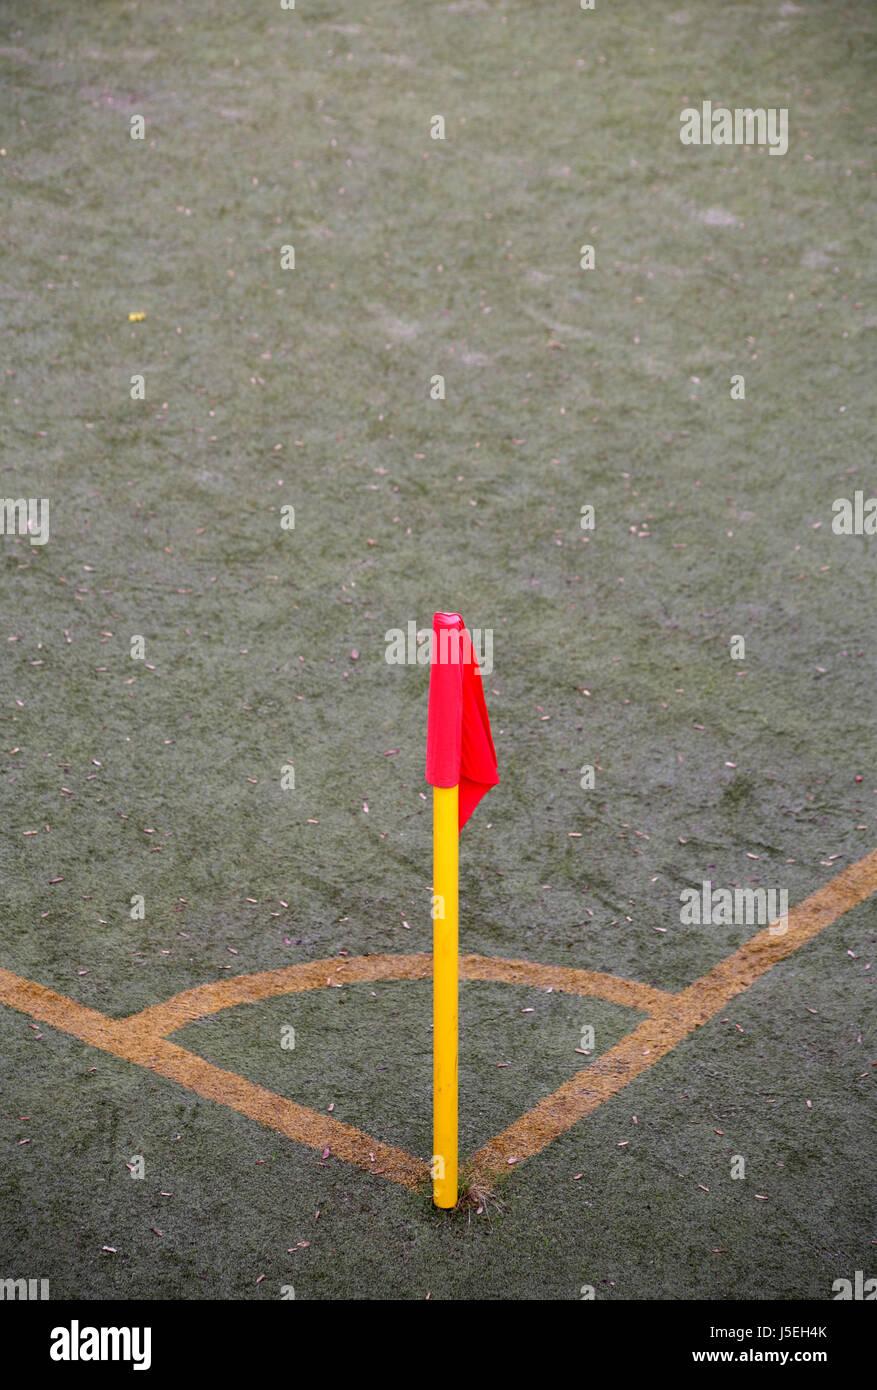 sport sports ball sport flag ash corner marking angle sports field kick corner Stock Photo